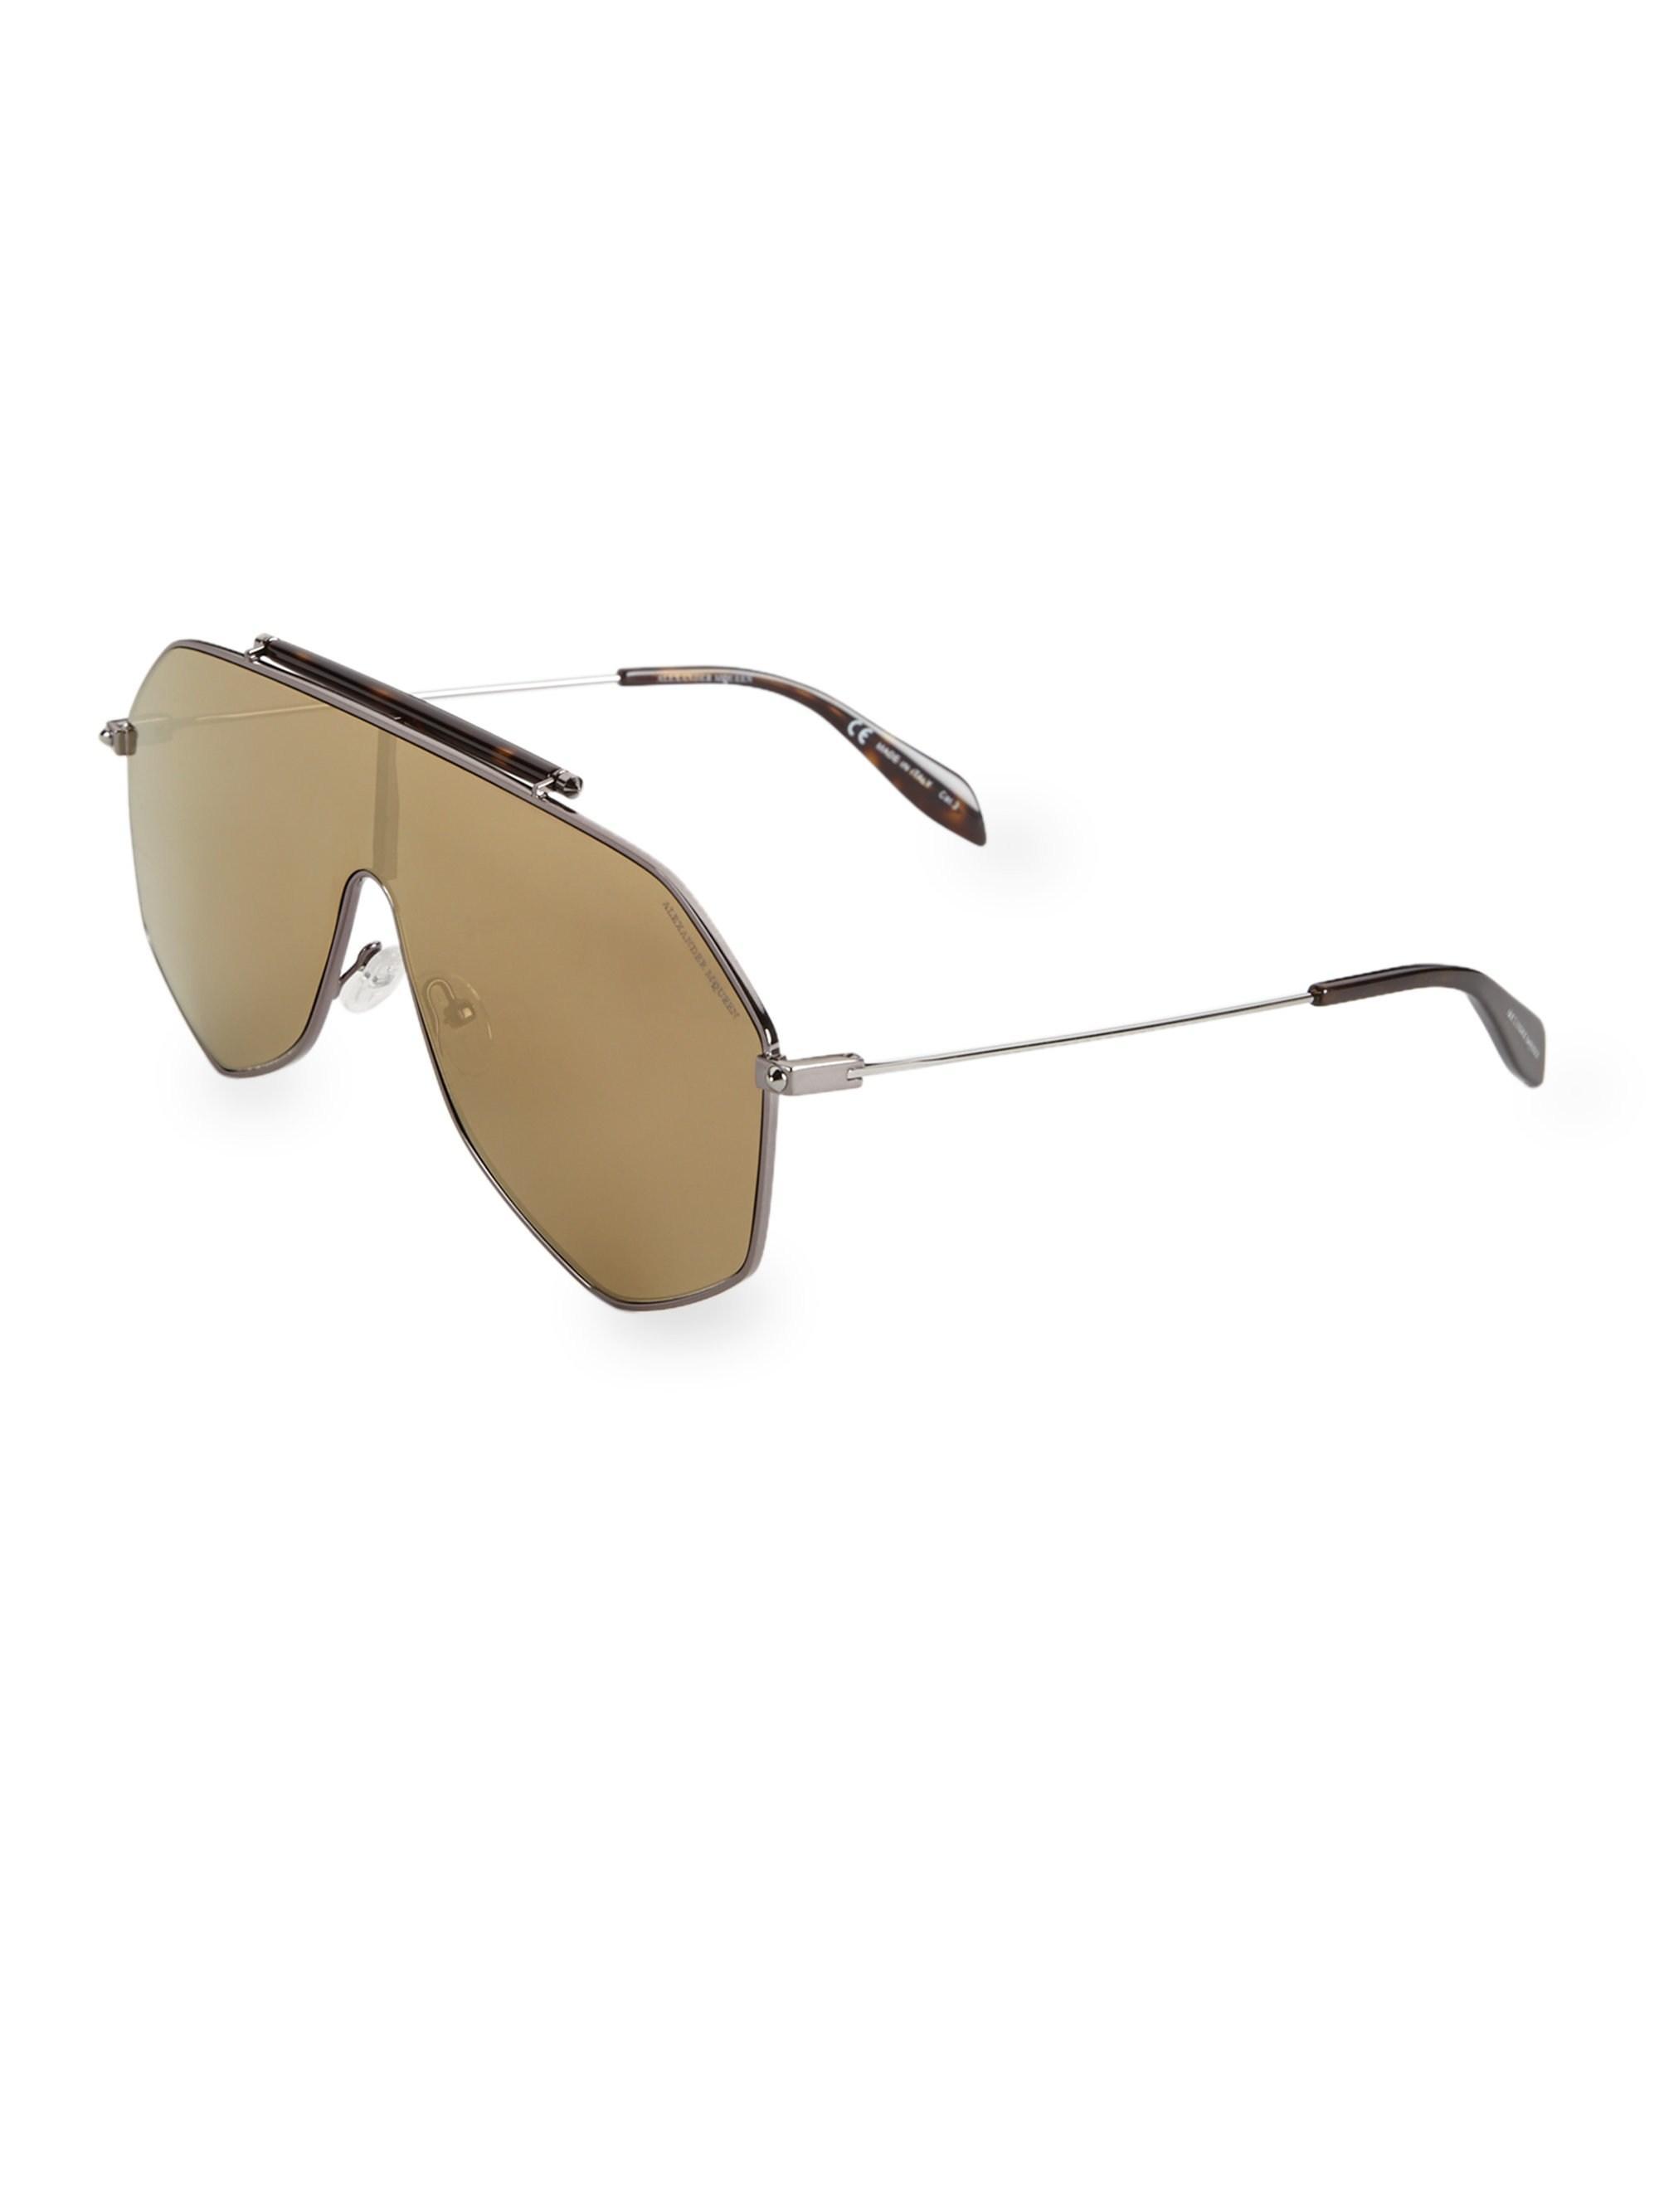 d00833a0b664 Alexander McQueen - Multicolor Men s Piercing 99mm Shield Sunglasses -  Ruthenium Havana for Men - Lyst. View fullscreen